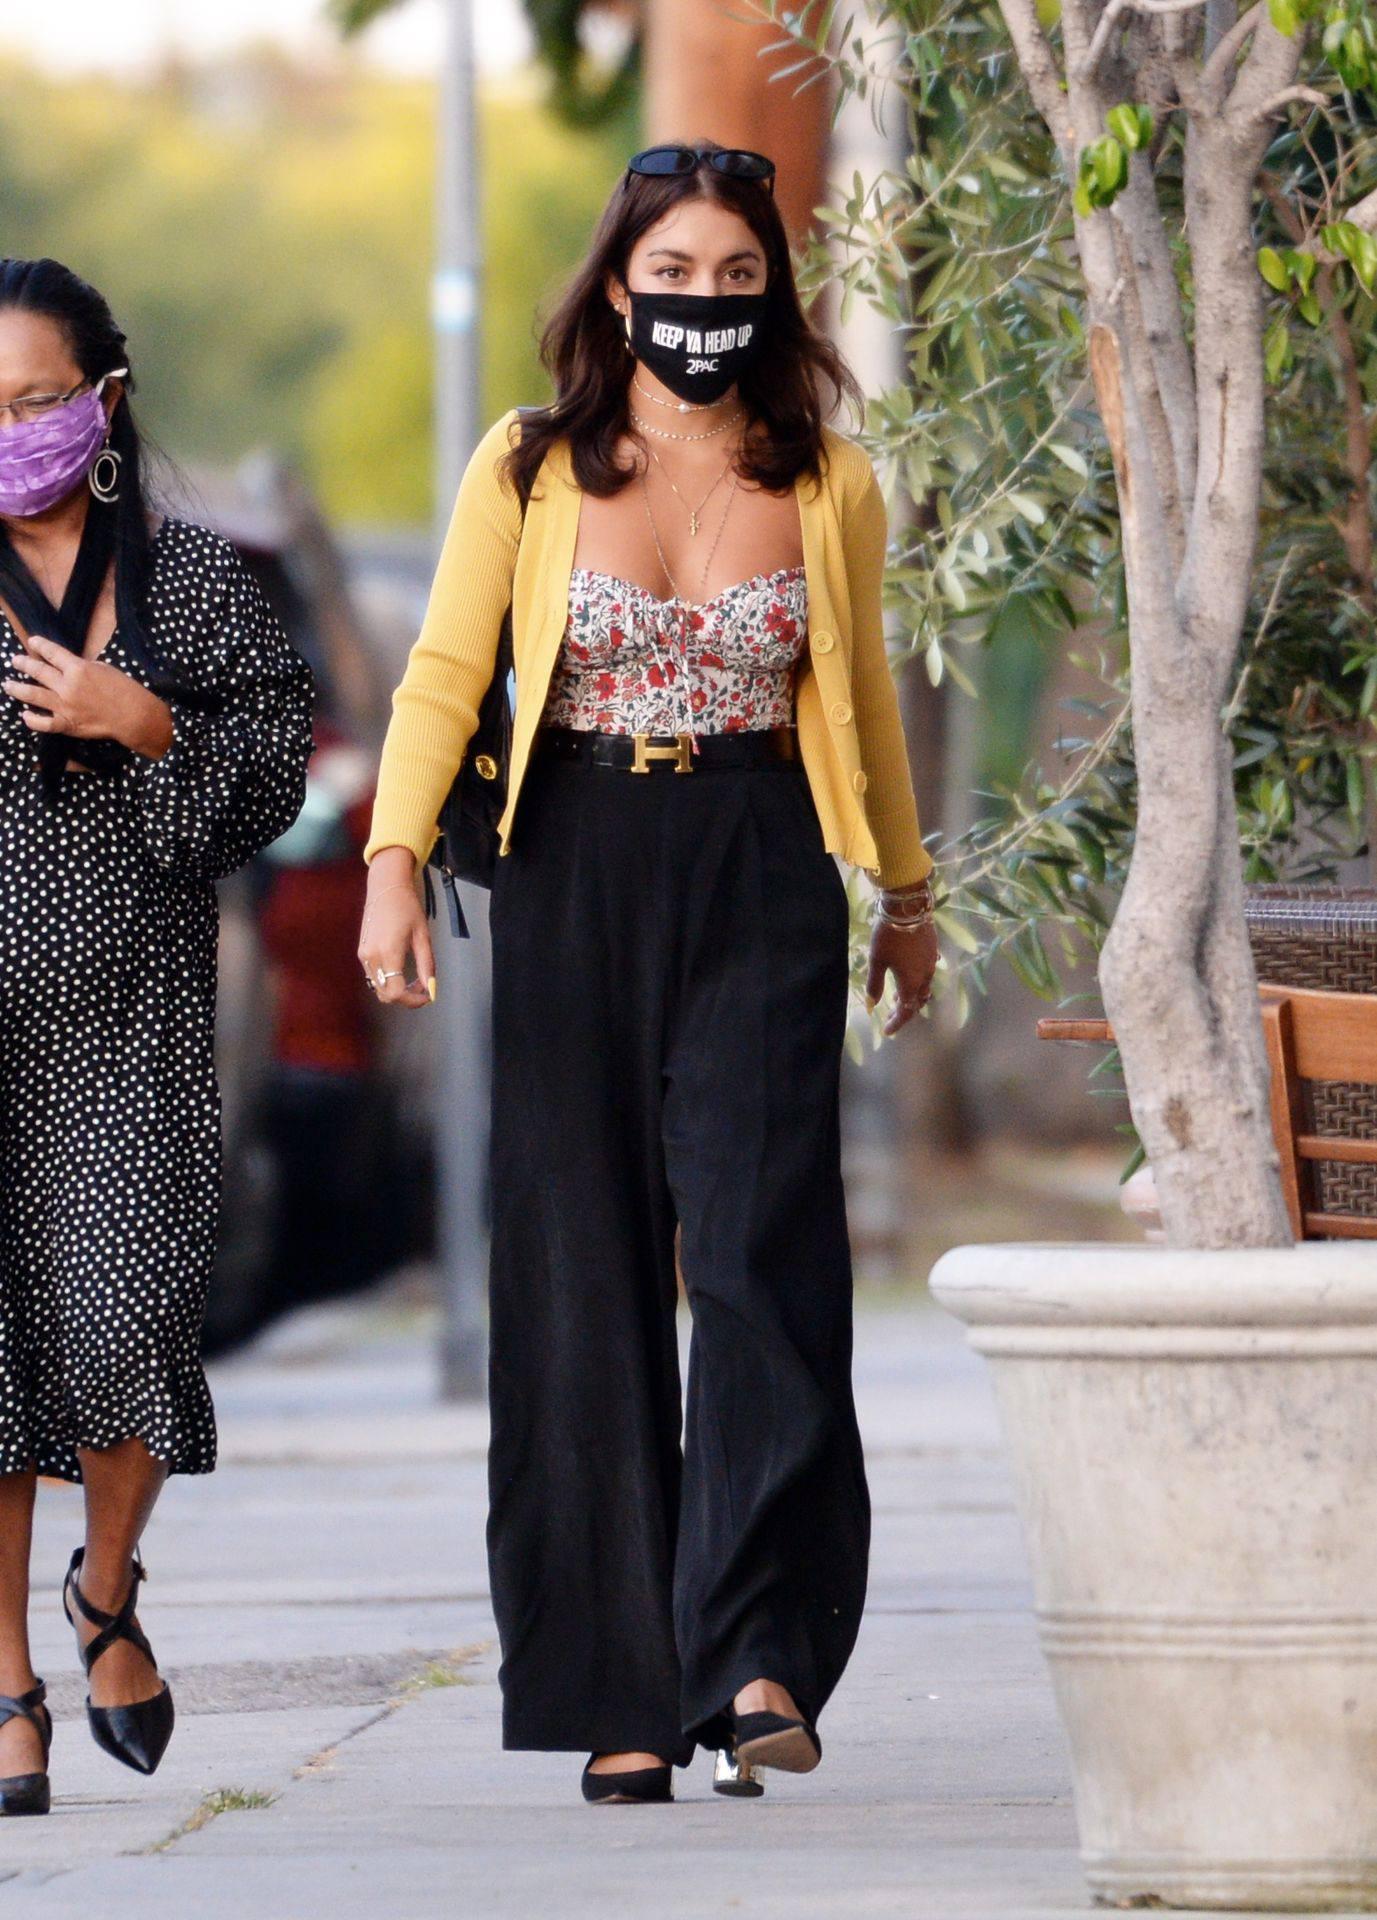 Vanessa Hudgens – Sexy Boobs And Ass At Farfalla In Los Angeles 0002